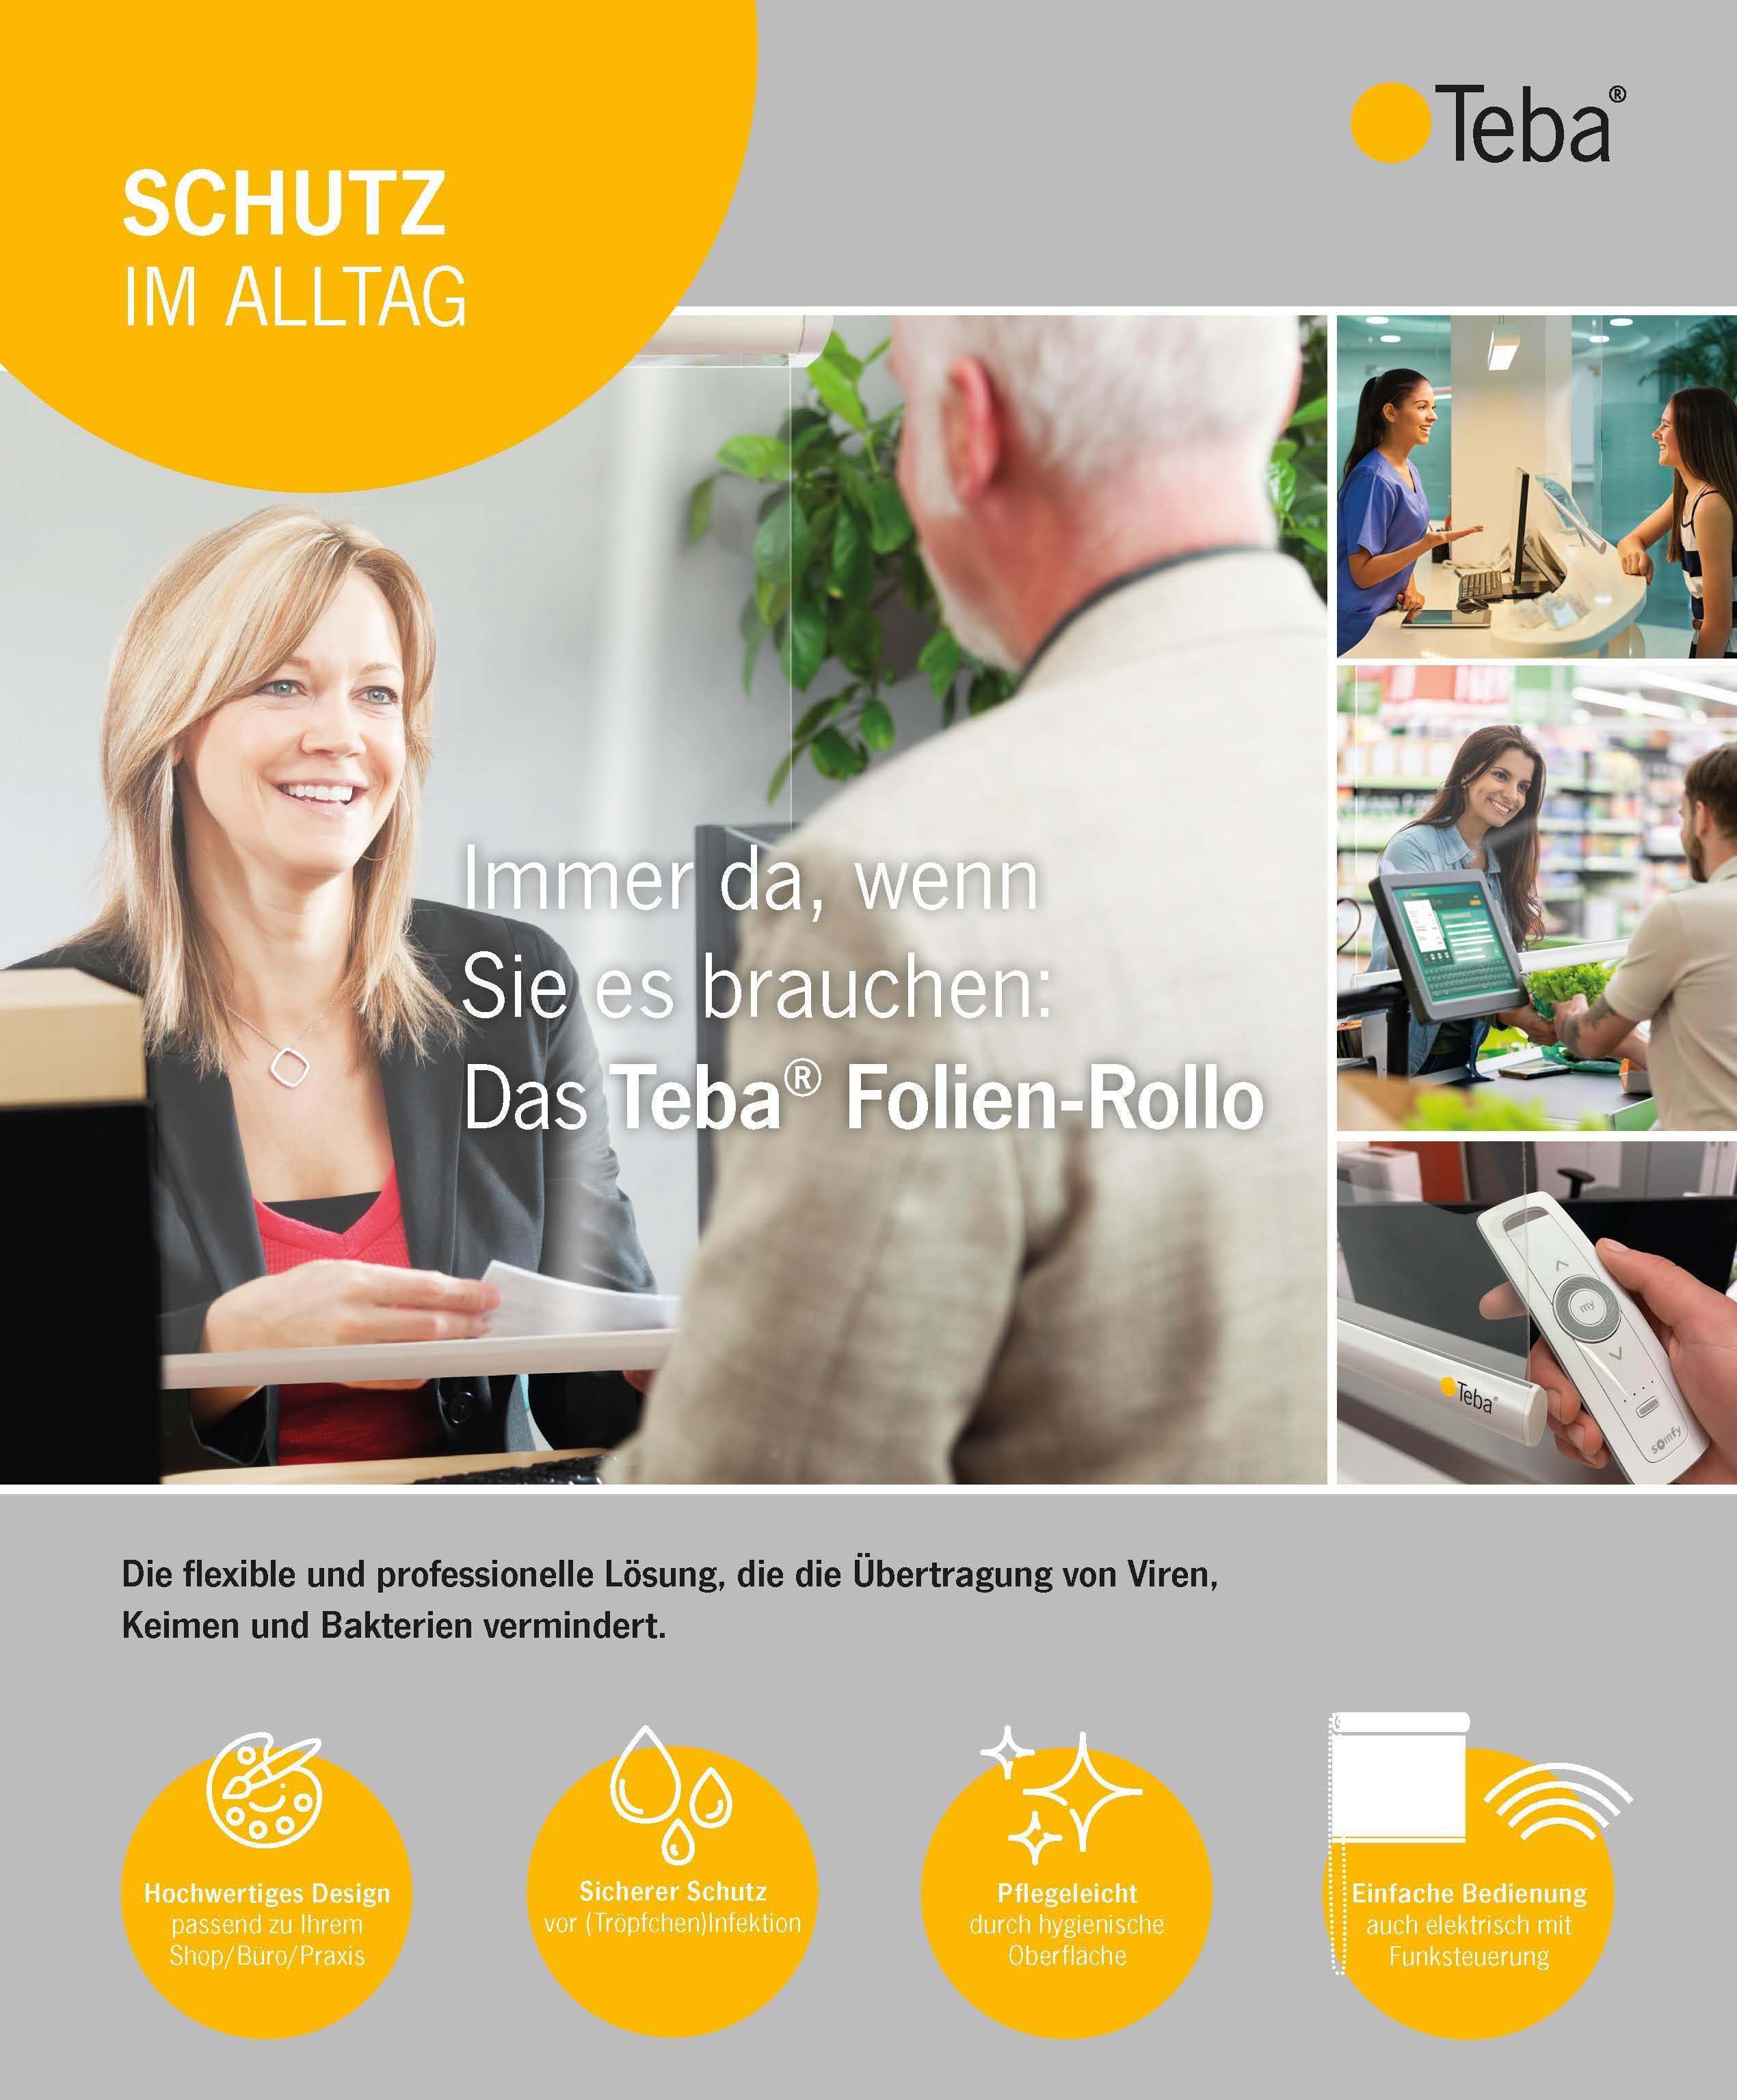 Teba Folien-Rollo Produktflyer Einzelblatt30148 (1)-1_Seite_1